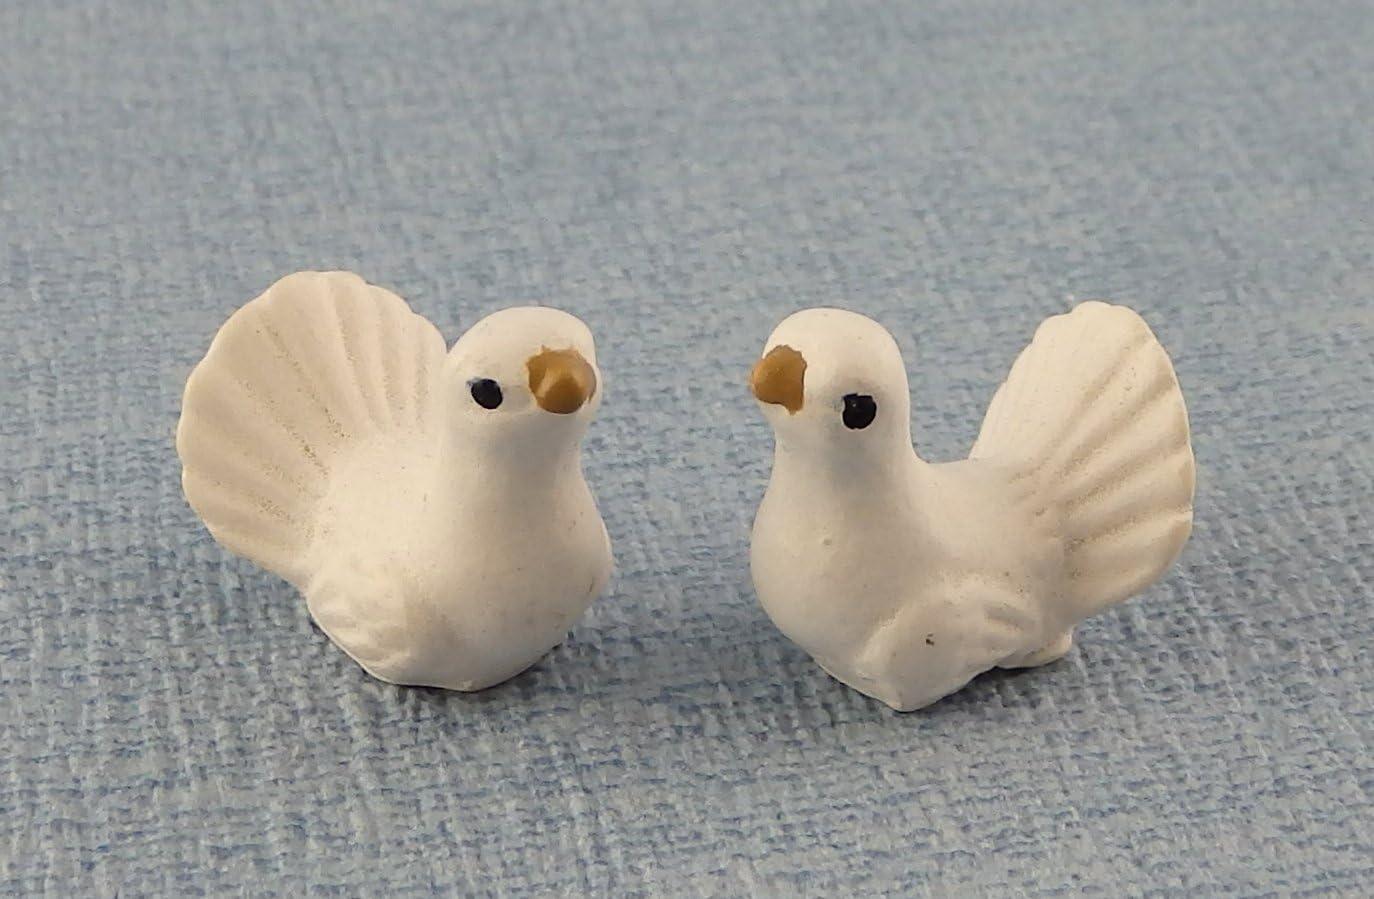 Melody Jane Dollhouse Miniature Pet Garden Accessory Birds Pair of White Turtle Doves